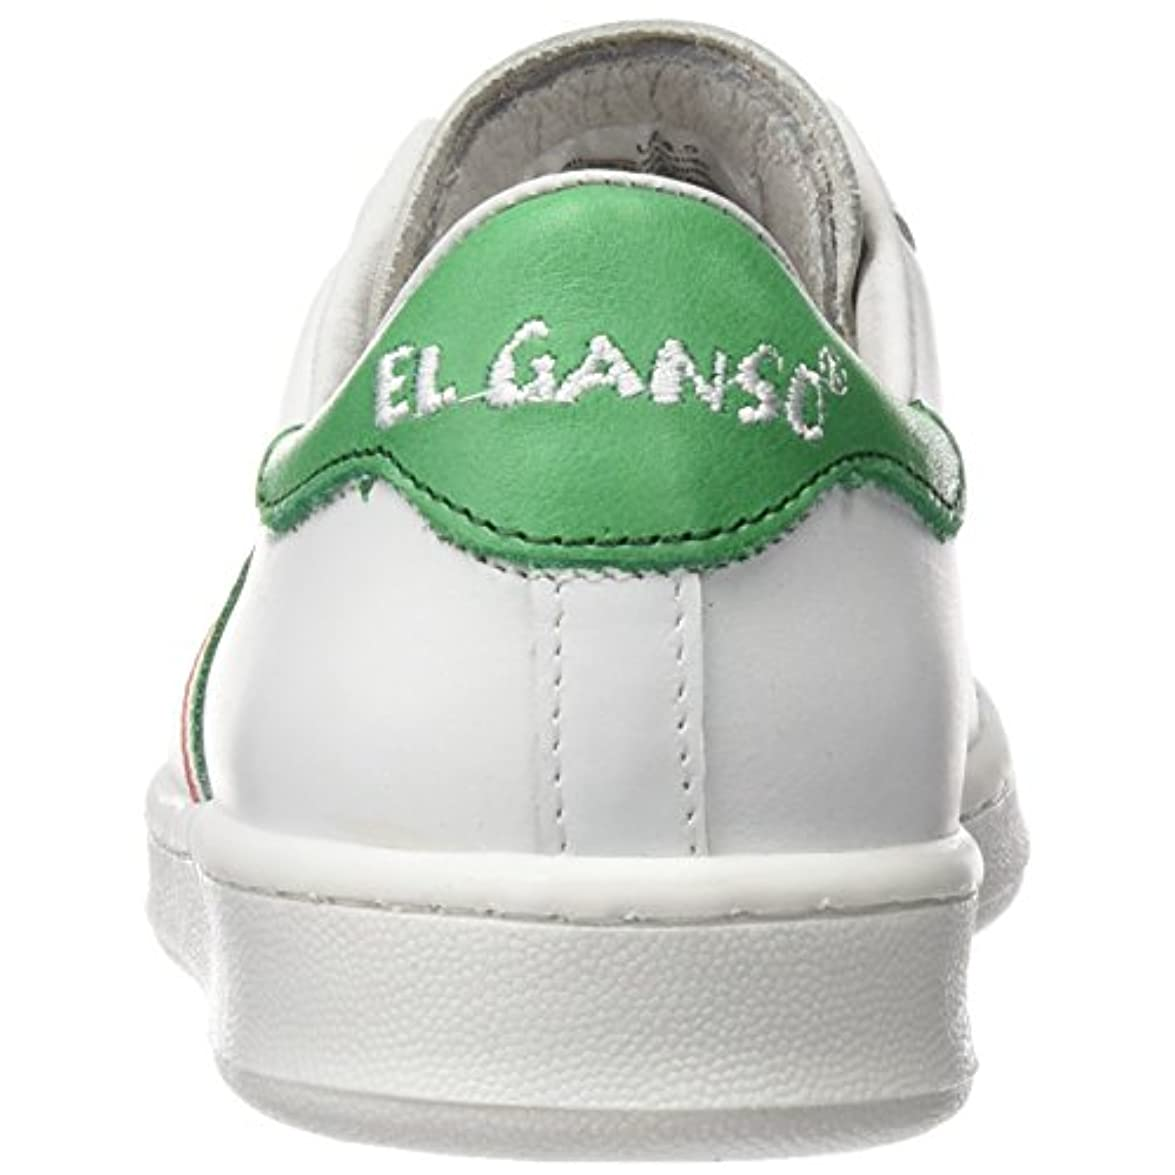 El Ganso - Low Top Blanca Bandera Italia Sneaker Basse Unisex – Adulto